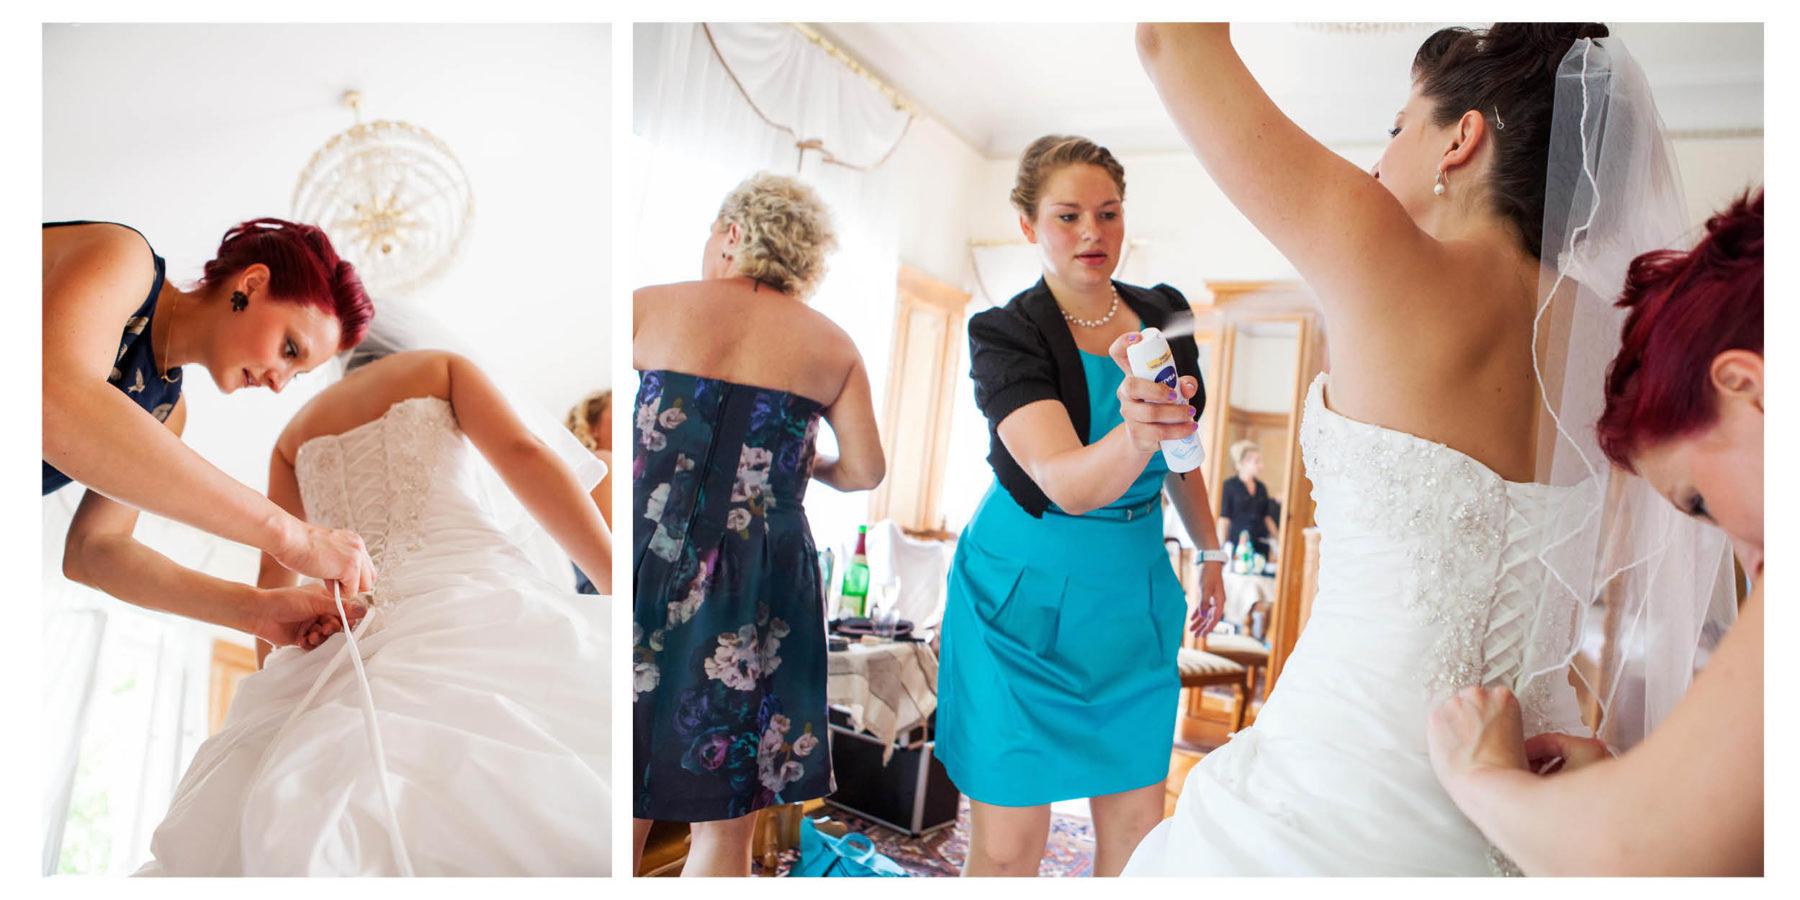 Hochzeit Pösnek 3